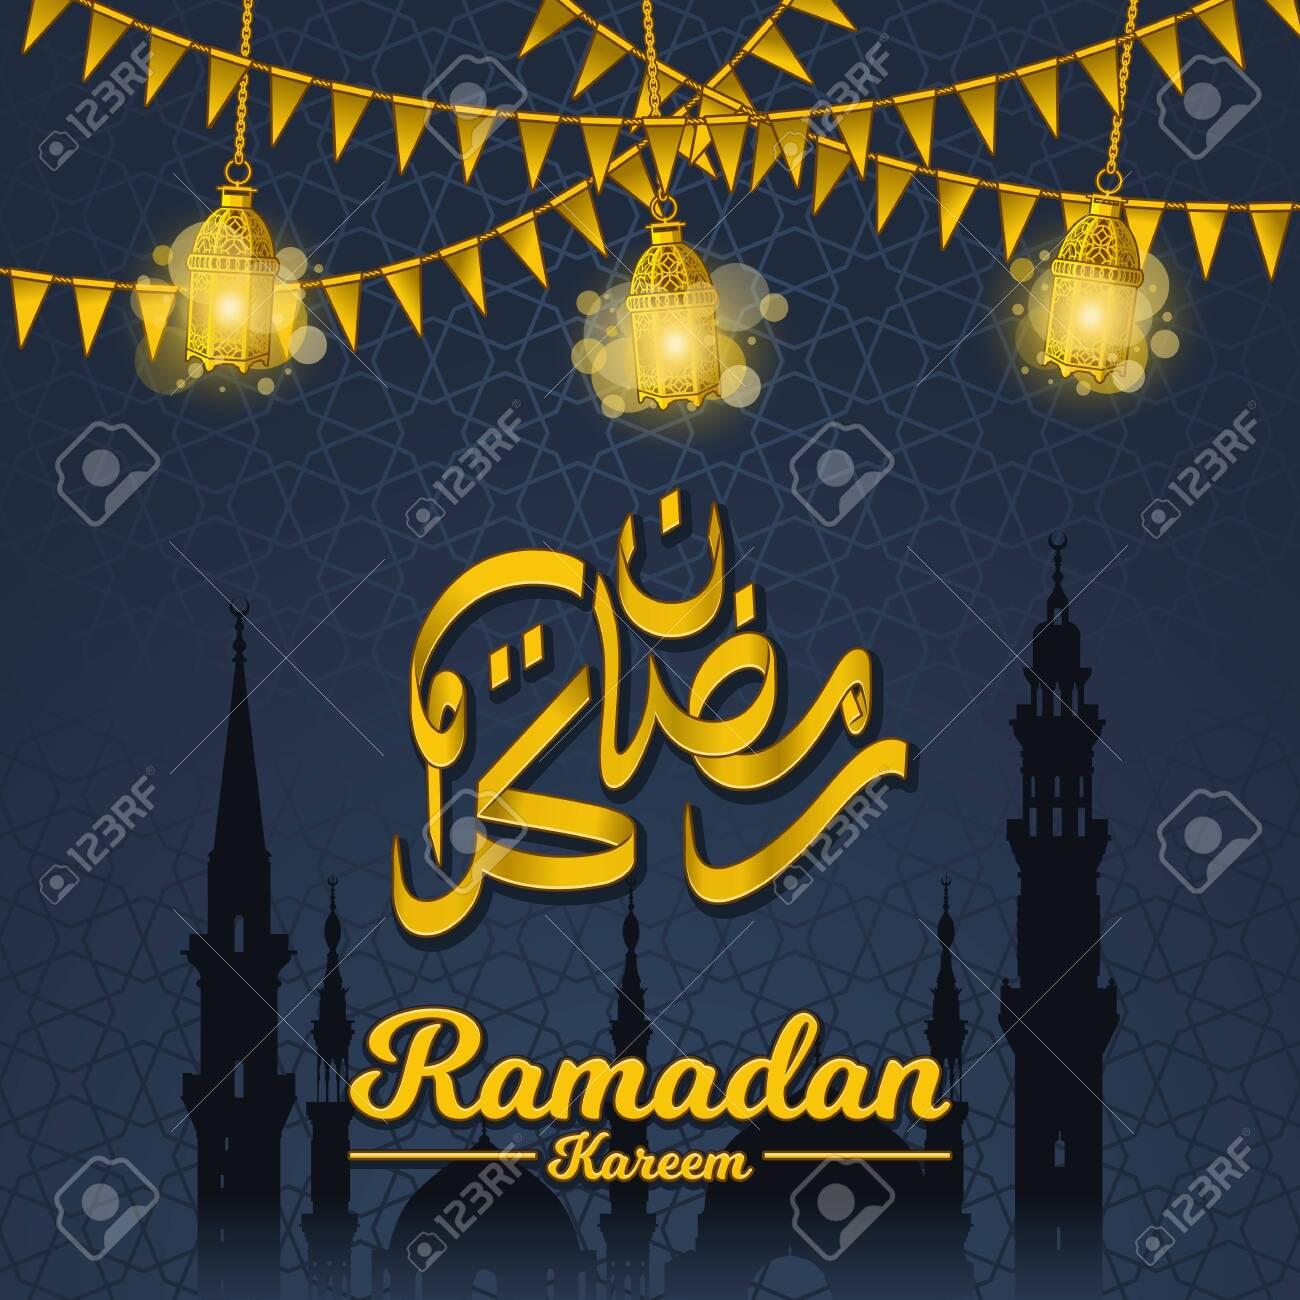 Islamic Greeting Card Design, Ramadan Kareem in Golden Arabic